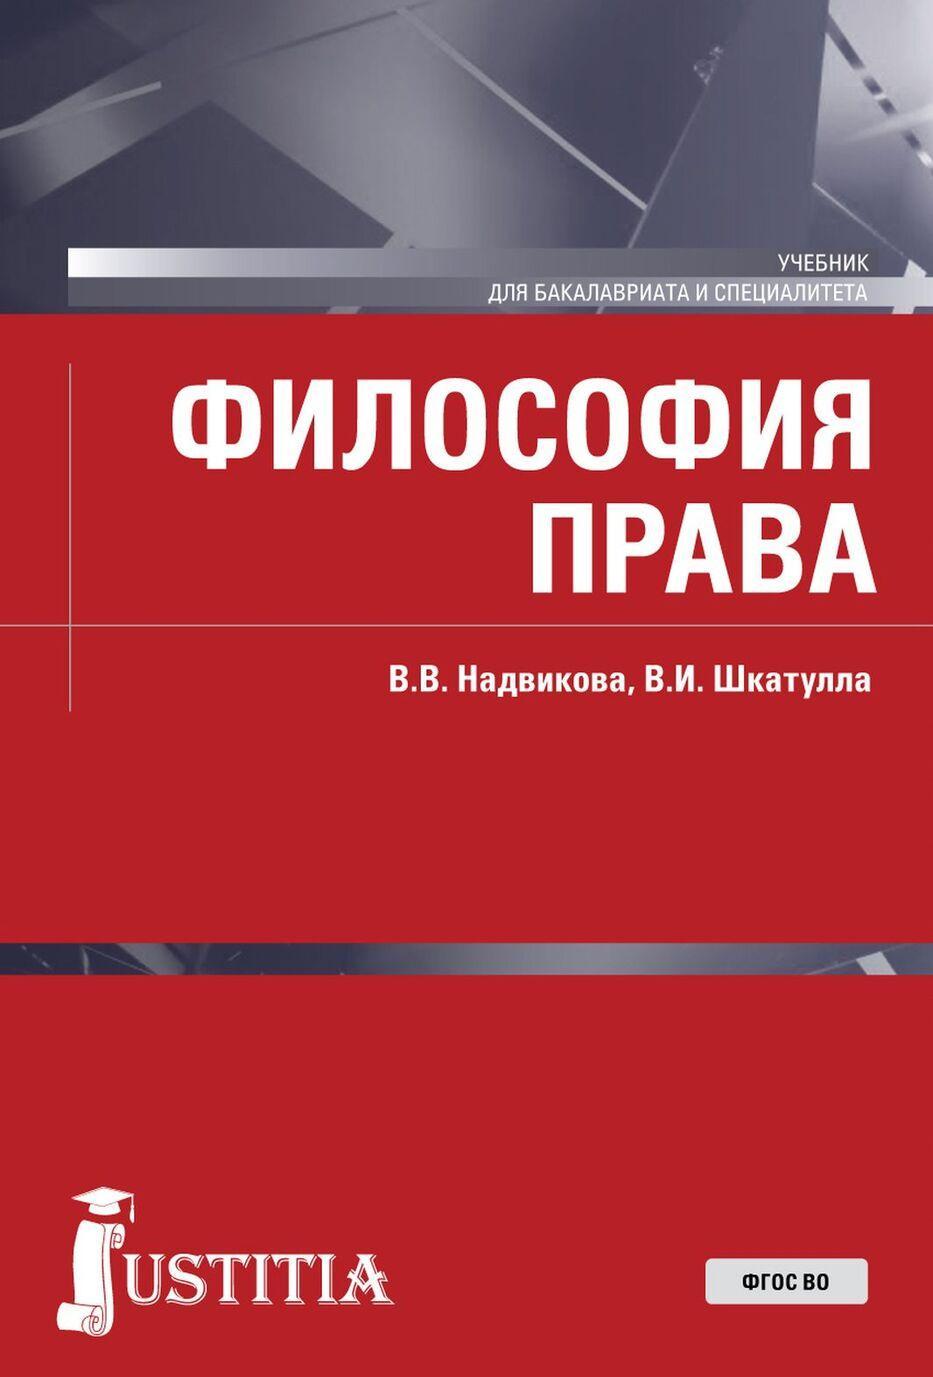 Filosofija prava. Uchebnik | Nadvikova Valentina Vasilevna, Shkatulla Vladimir Ivanovich